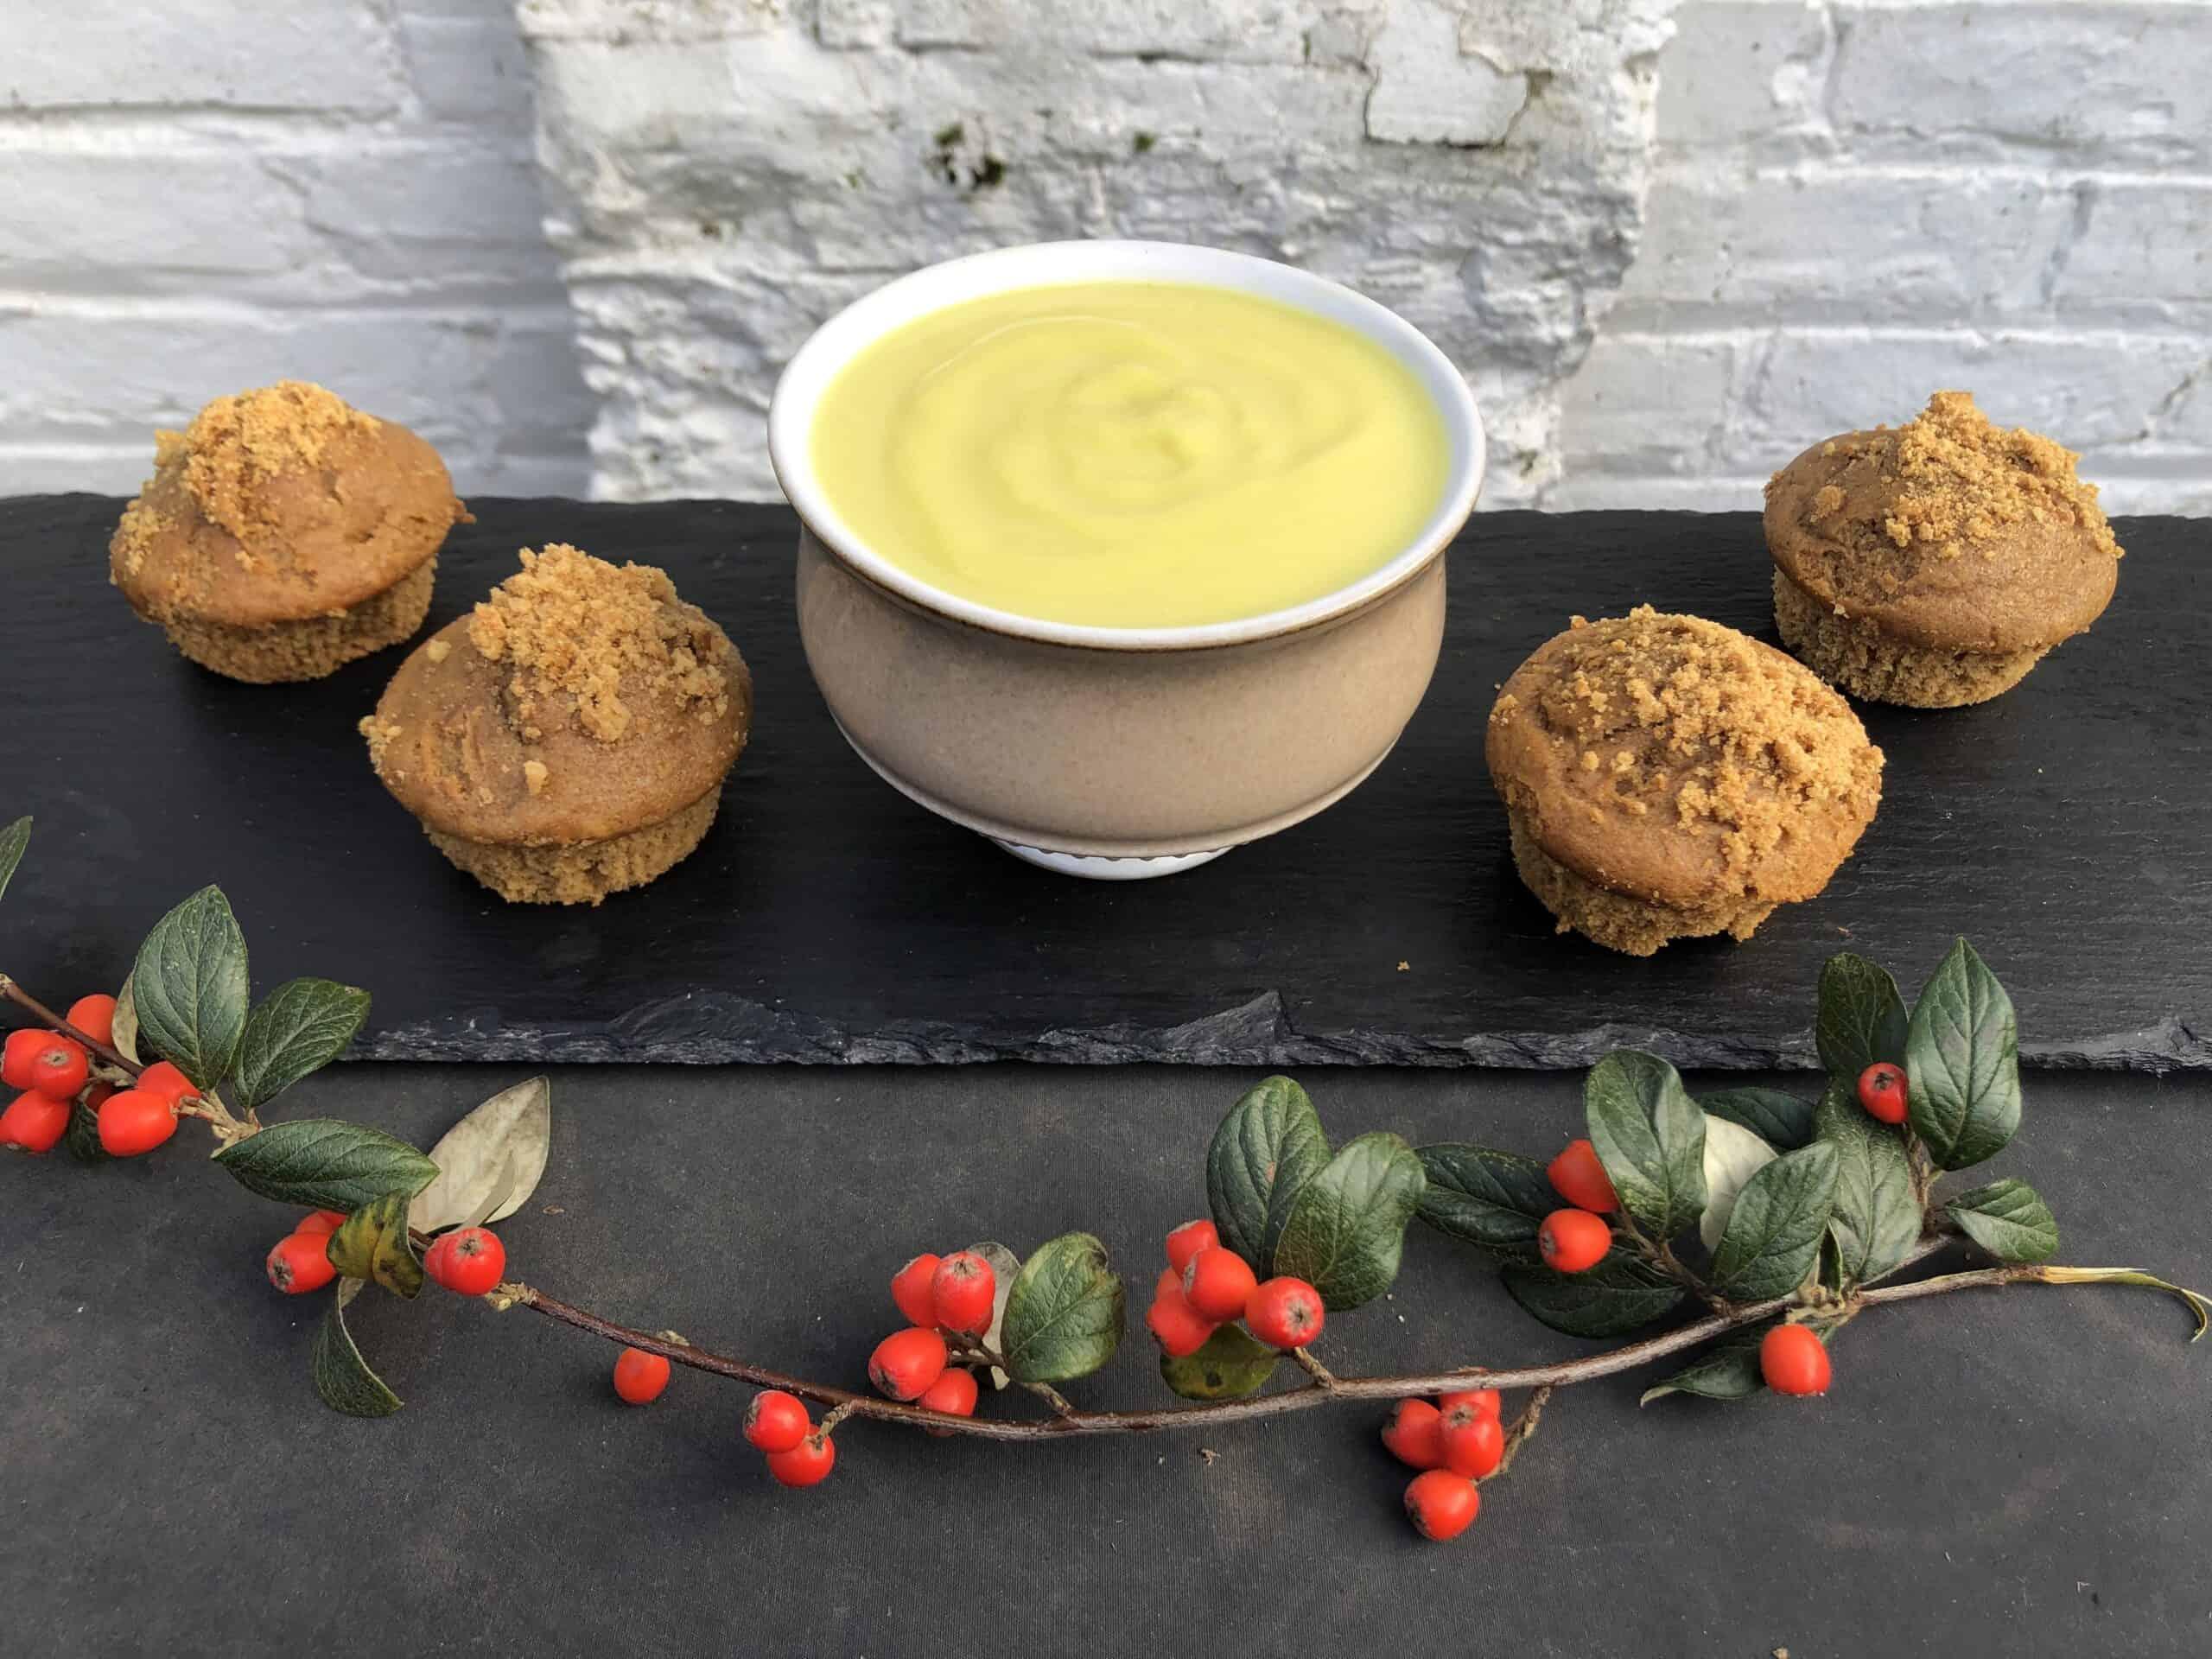 Easy Vegan Custard Recipe | Homemade Vegan Vanilla Custard